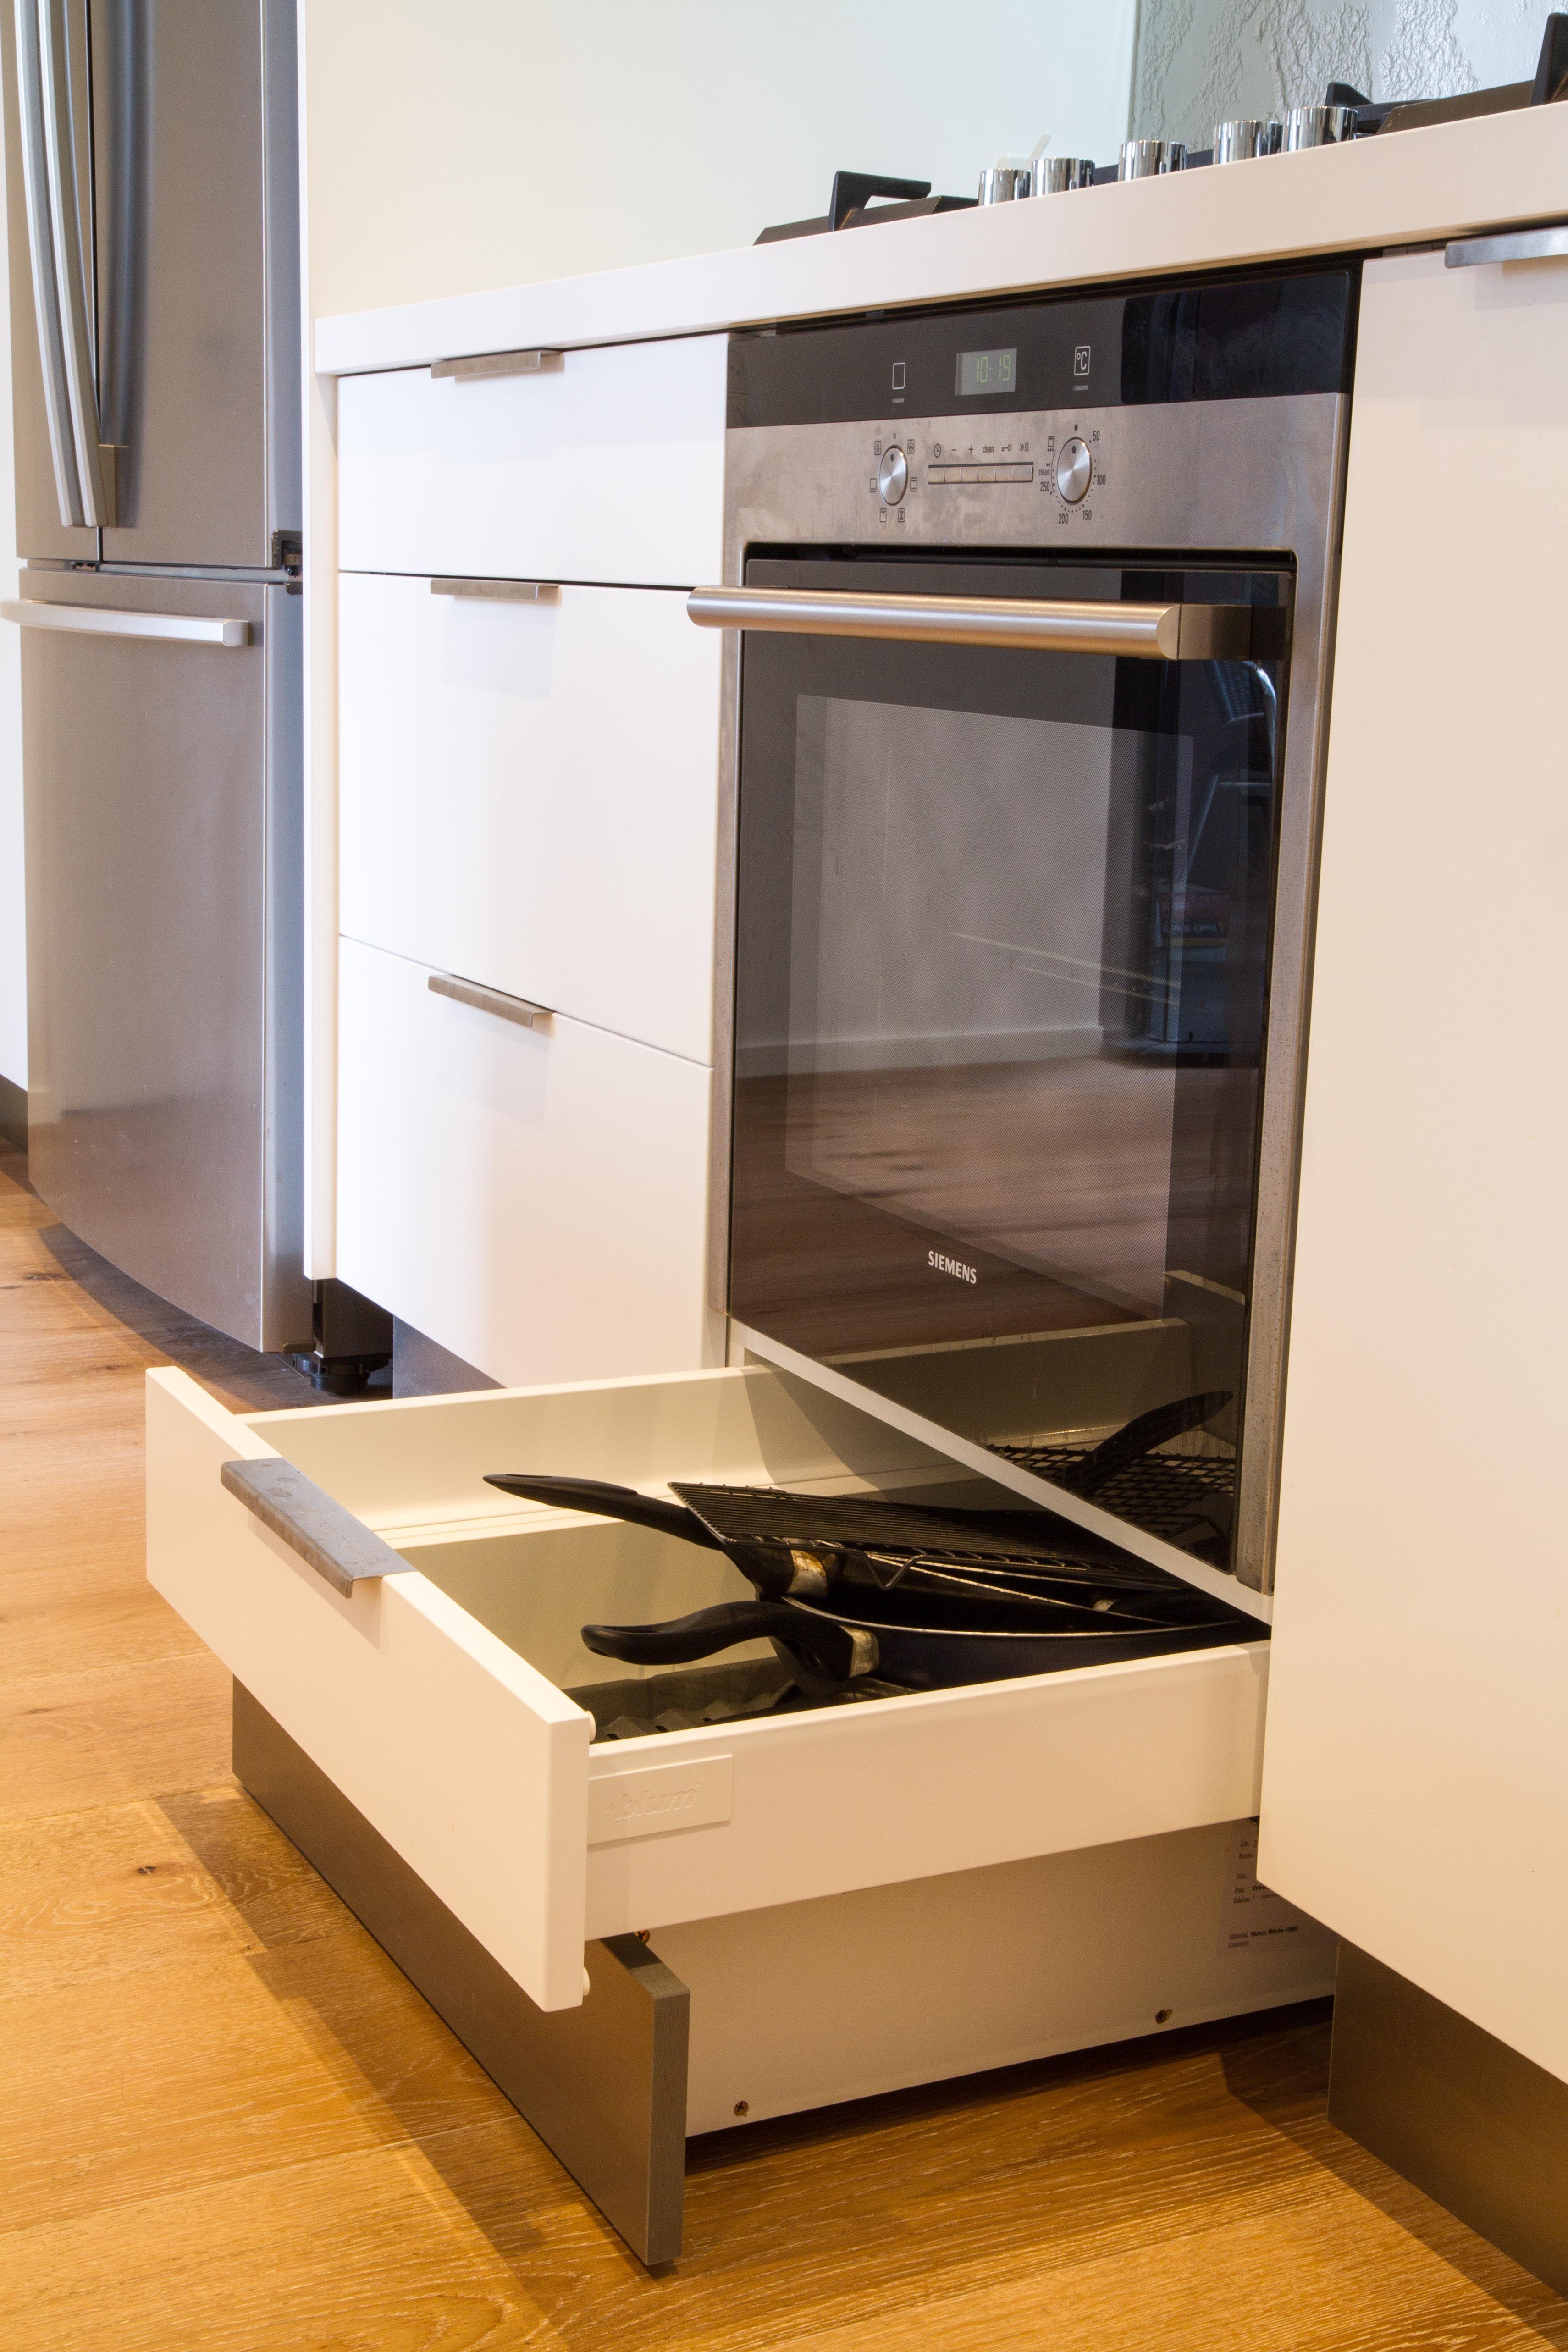 Uncategorized Discount Kitchen Appliances Melbourne integrated kickboard drawer under oven white kitchen www thekitchendesigncentre com